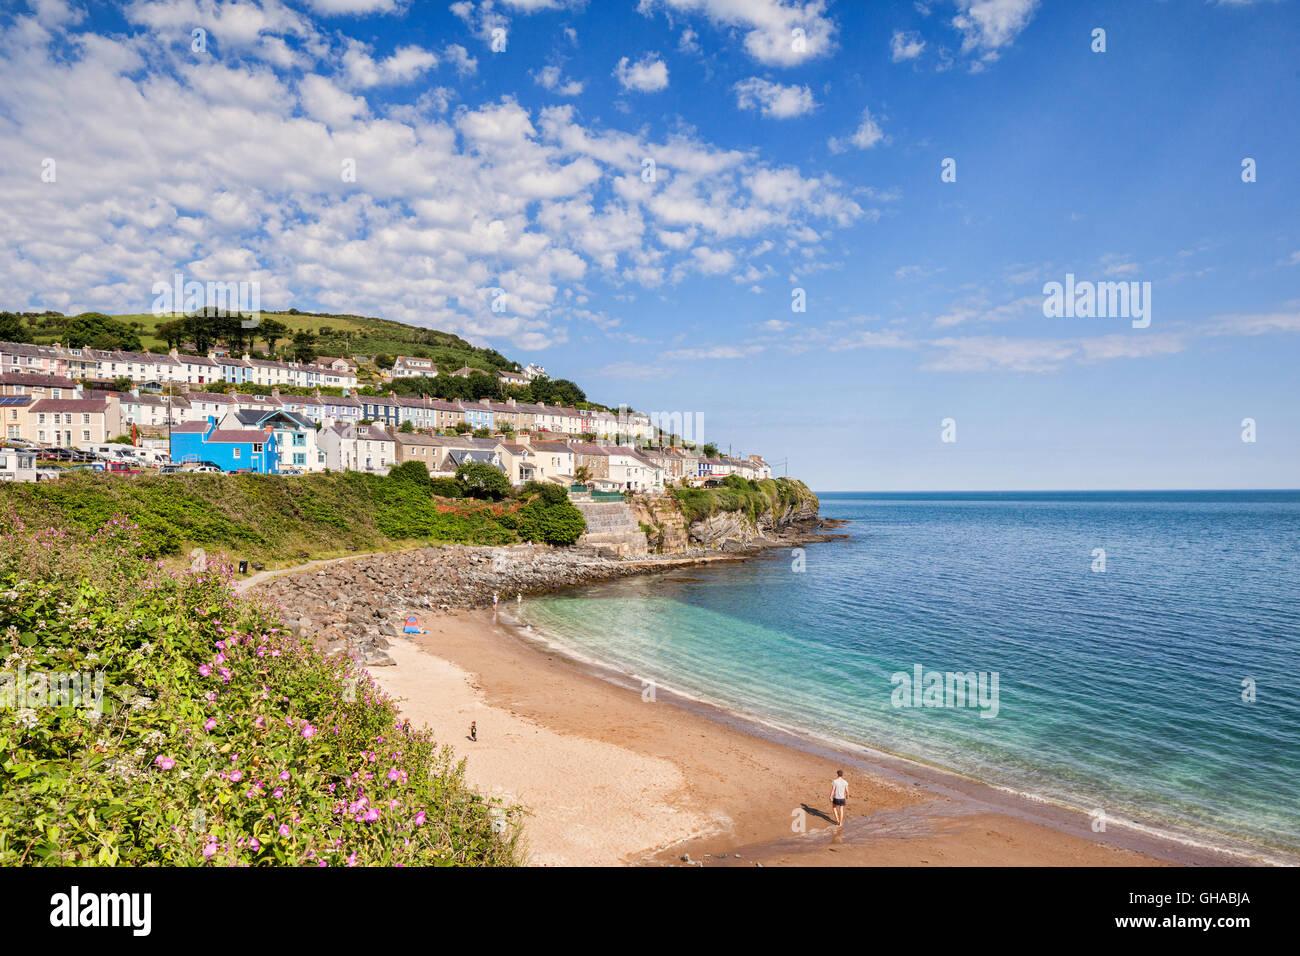 North beach at New Quay, Ceredigion, Wales, UK - Stock Image